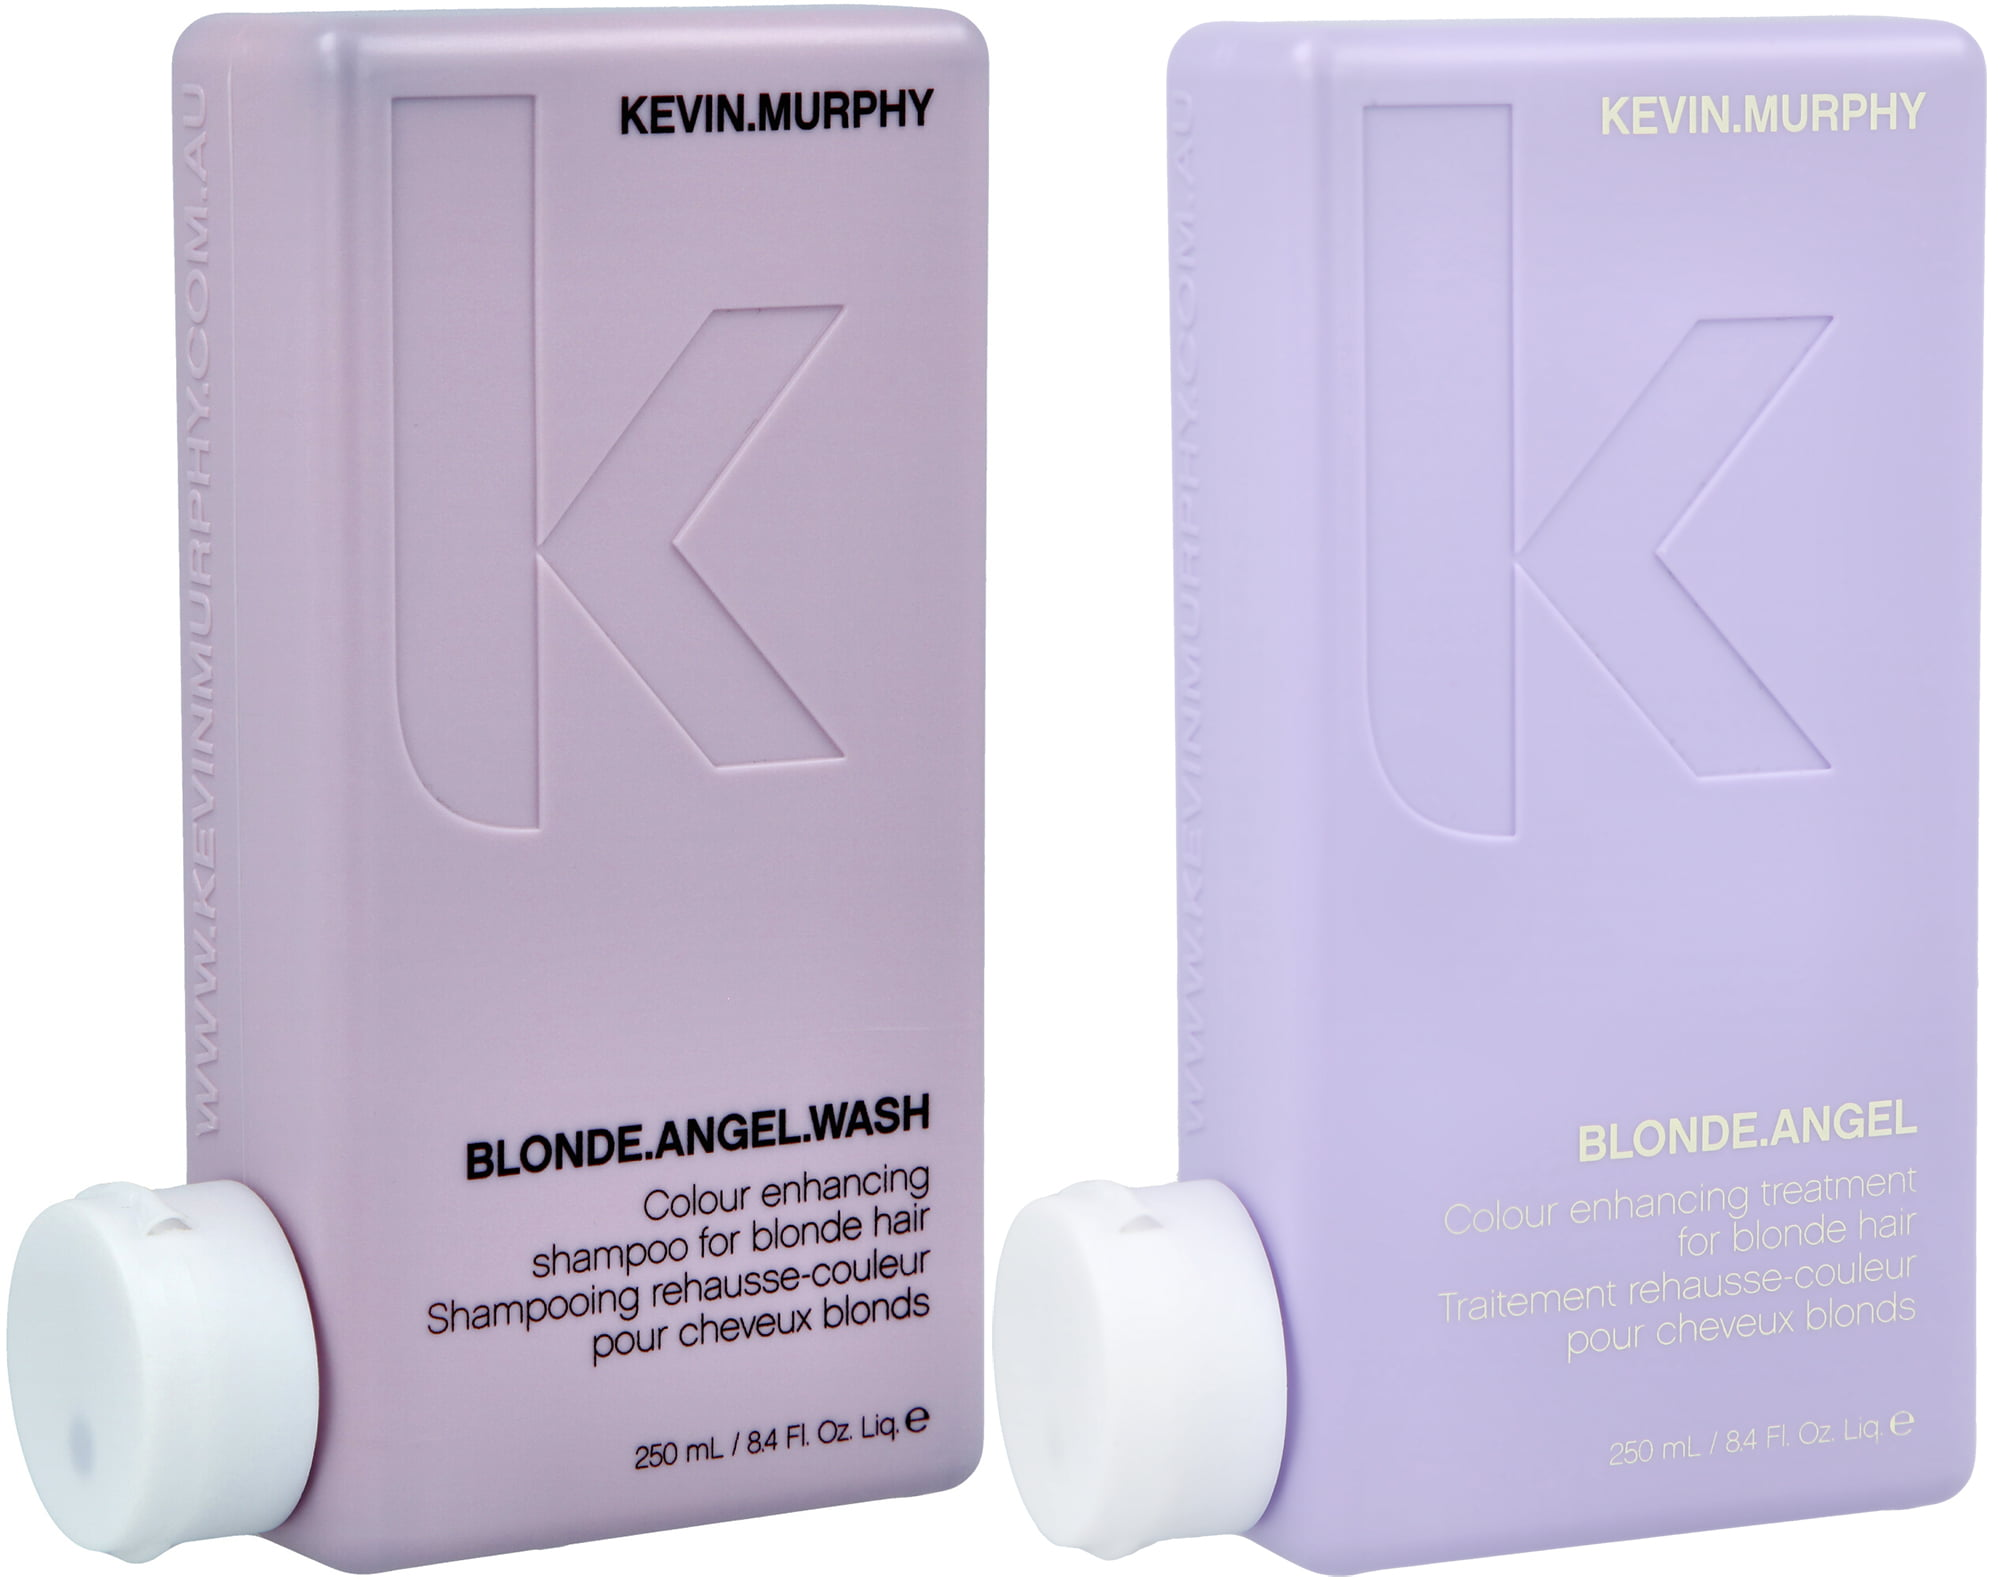 kevin murphy blonde angel shampoo conditioner 1462 903 0500 12